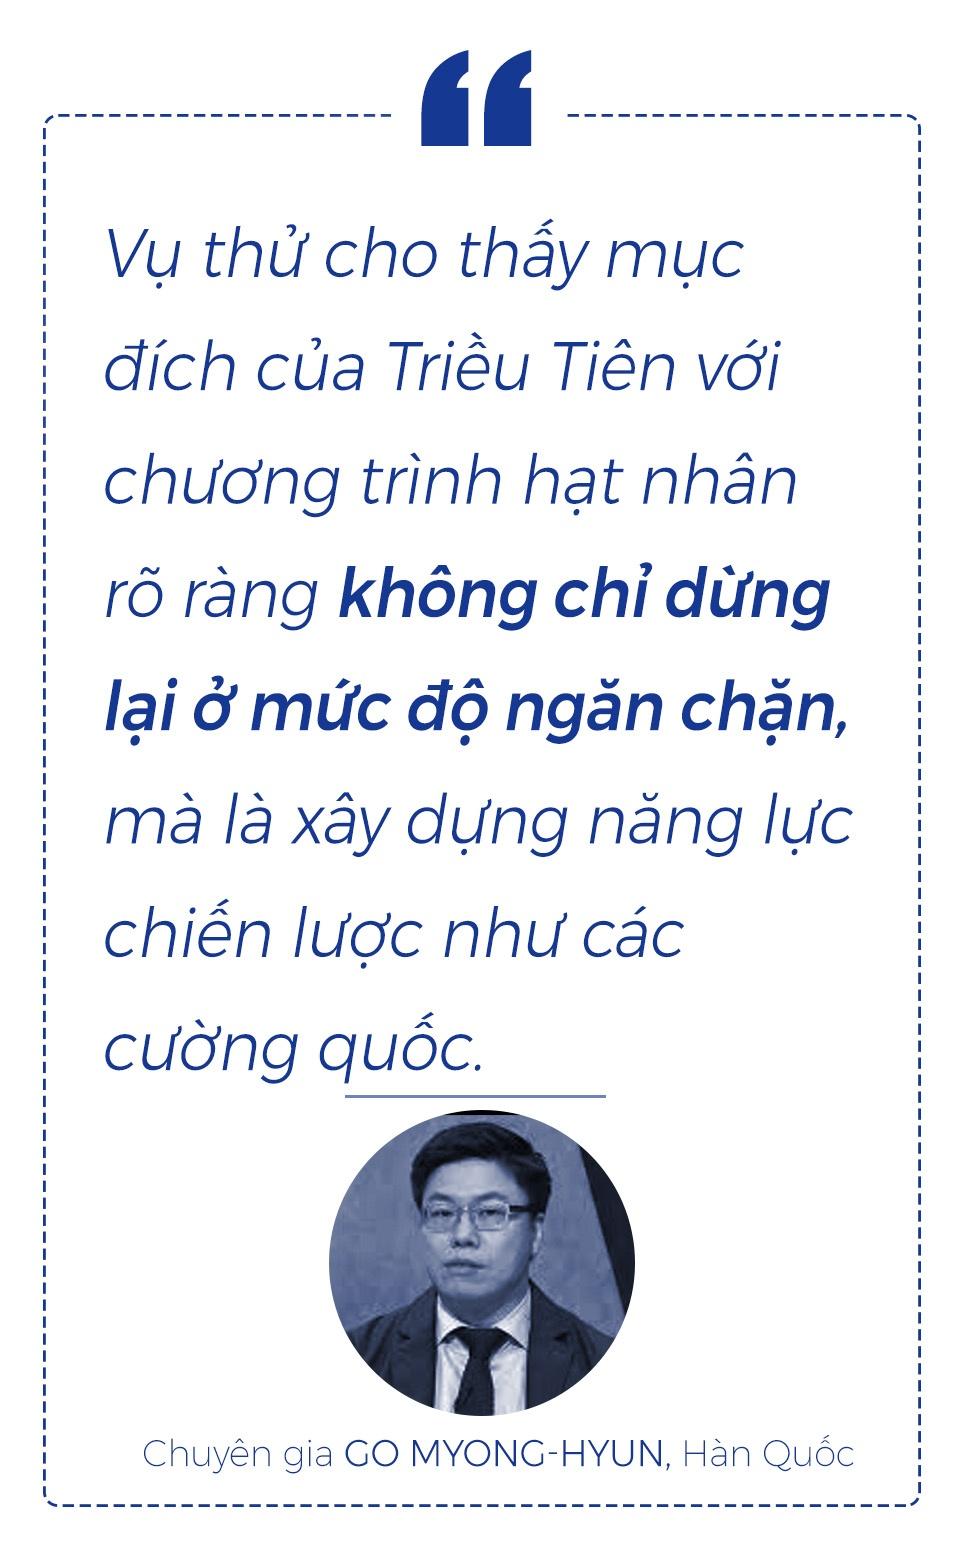 Thu bom H: Ban co thay doi, Trieu Tien co nguy hiem hon? hinh anh 3